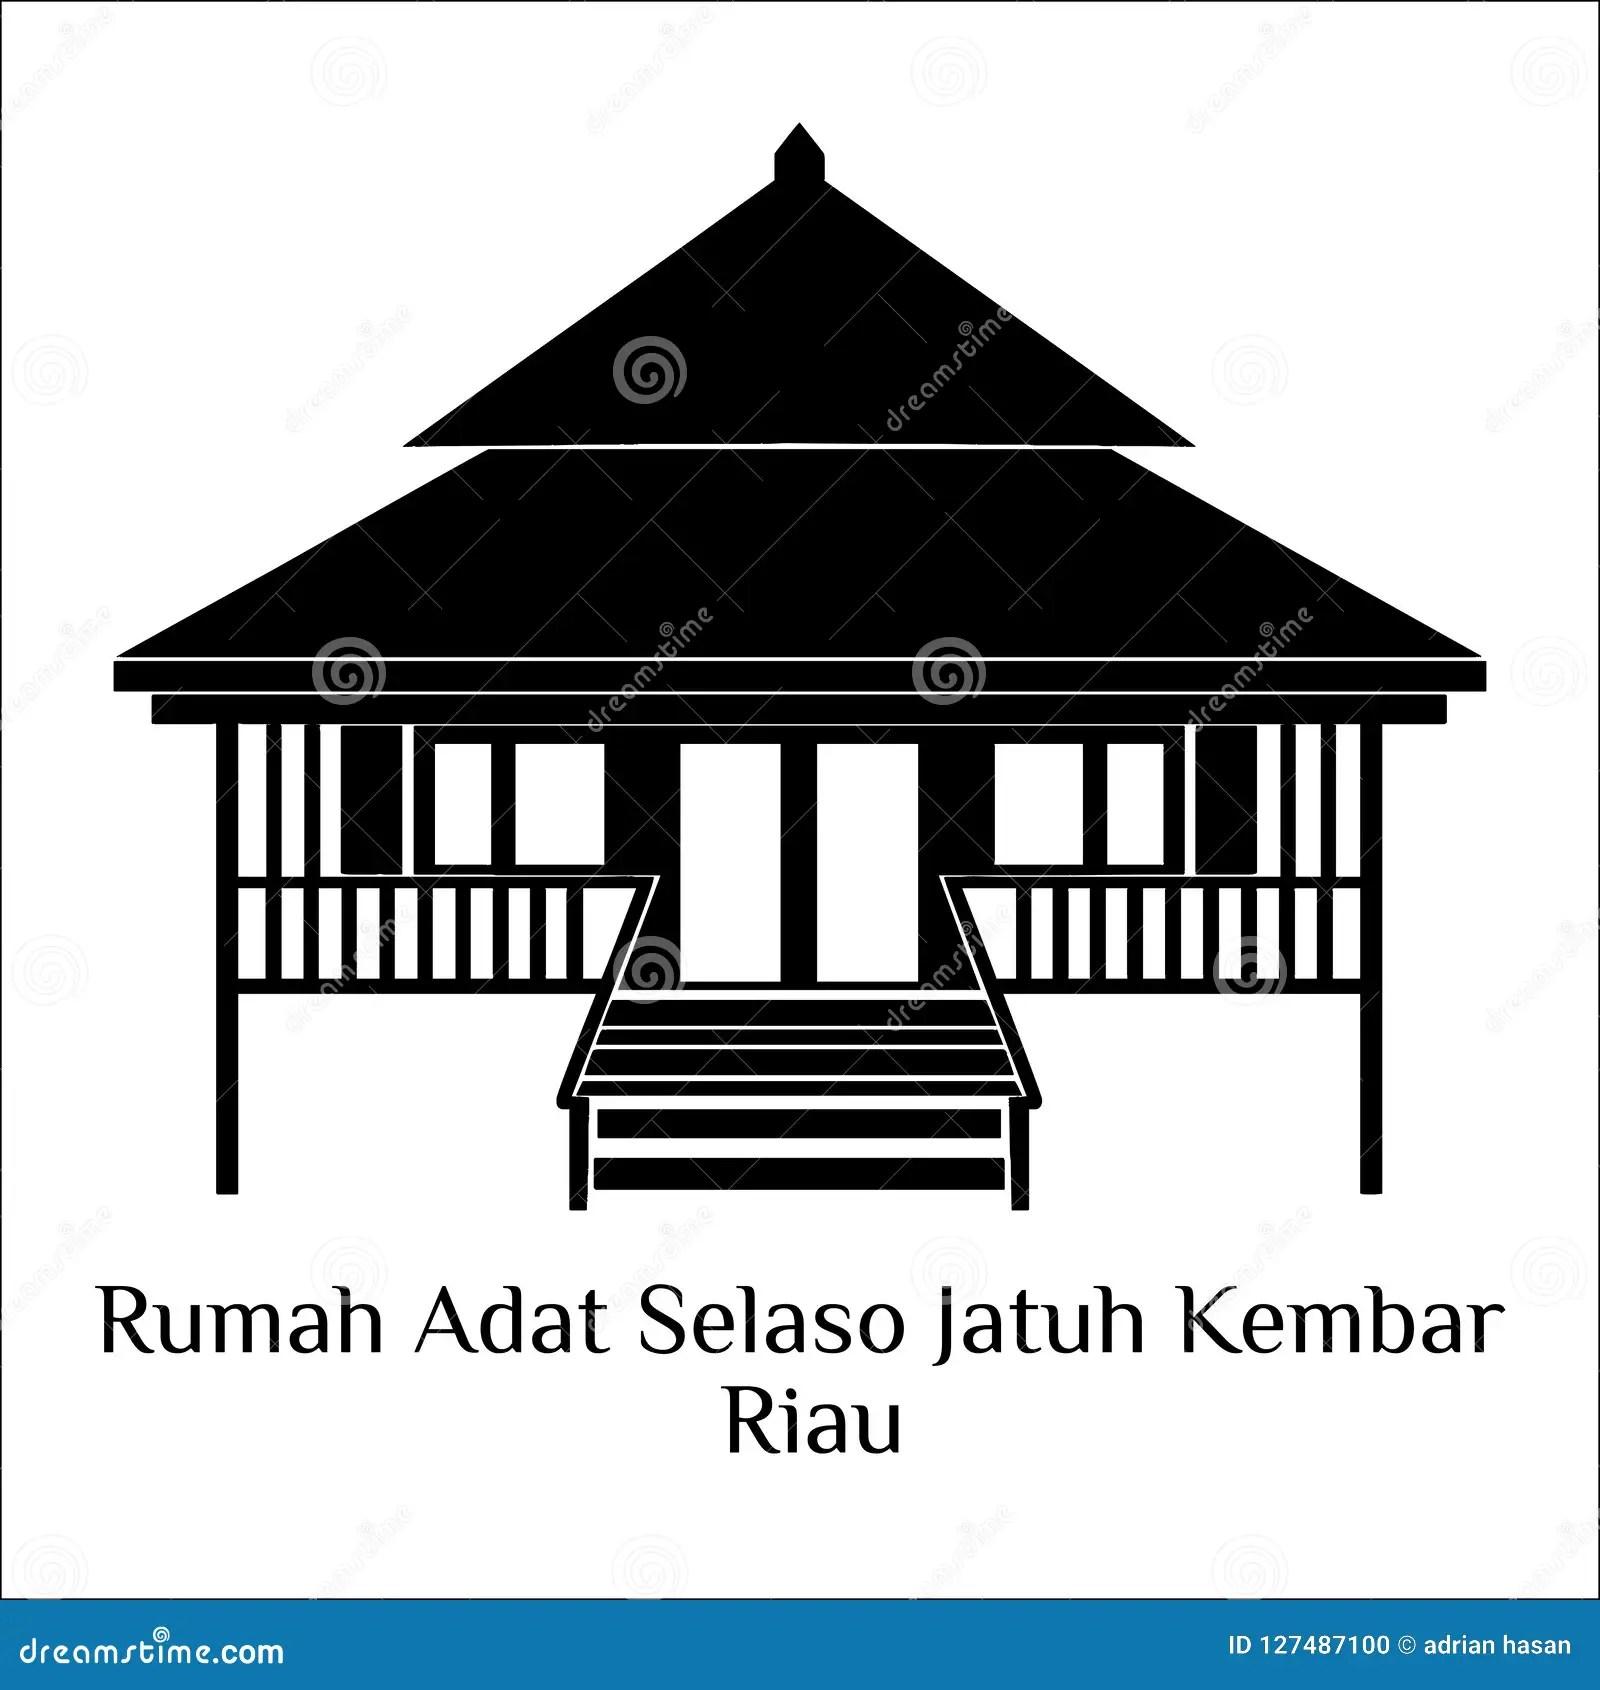 Rumah Adat Selaso Jatu Kembar Riau Stock Illustration Illustration